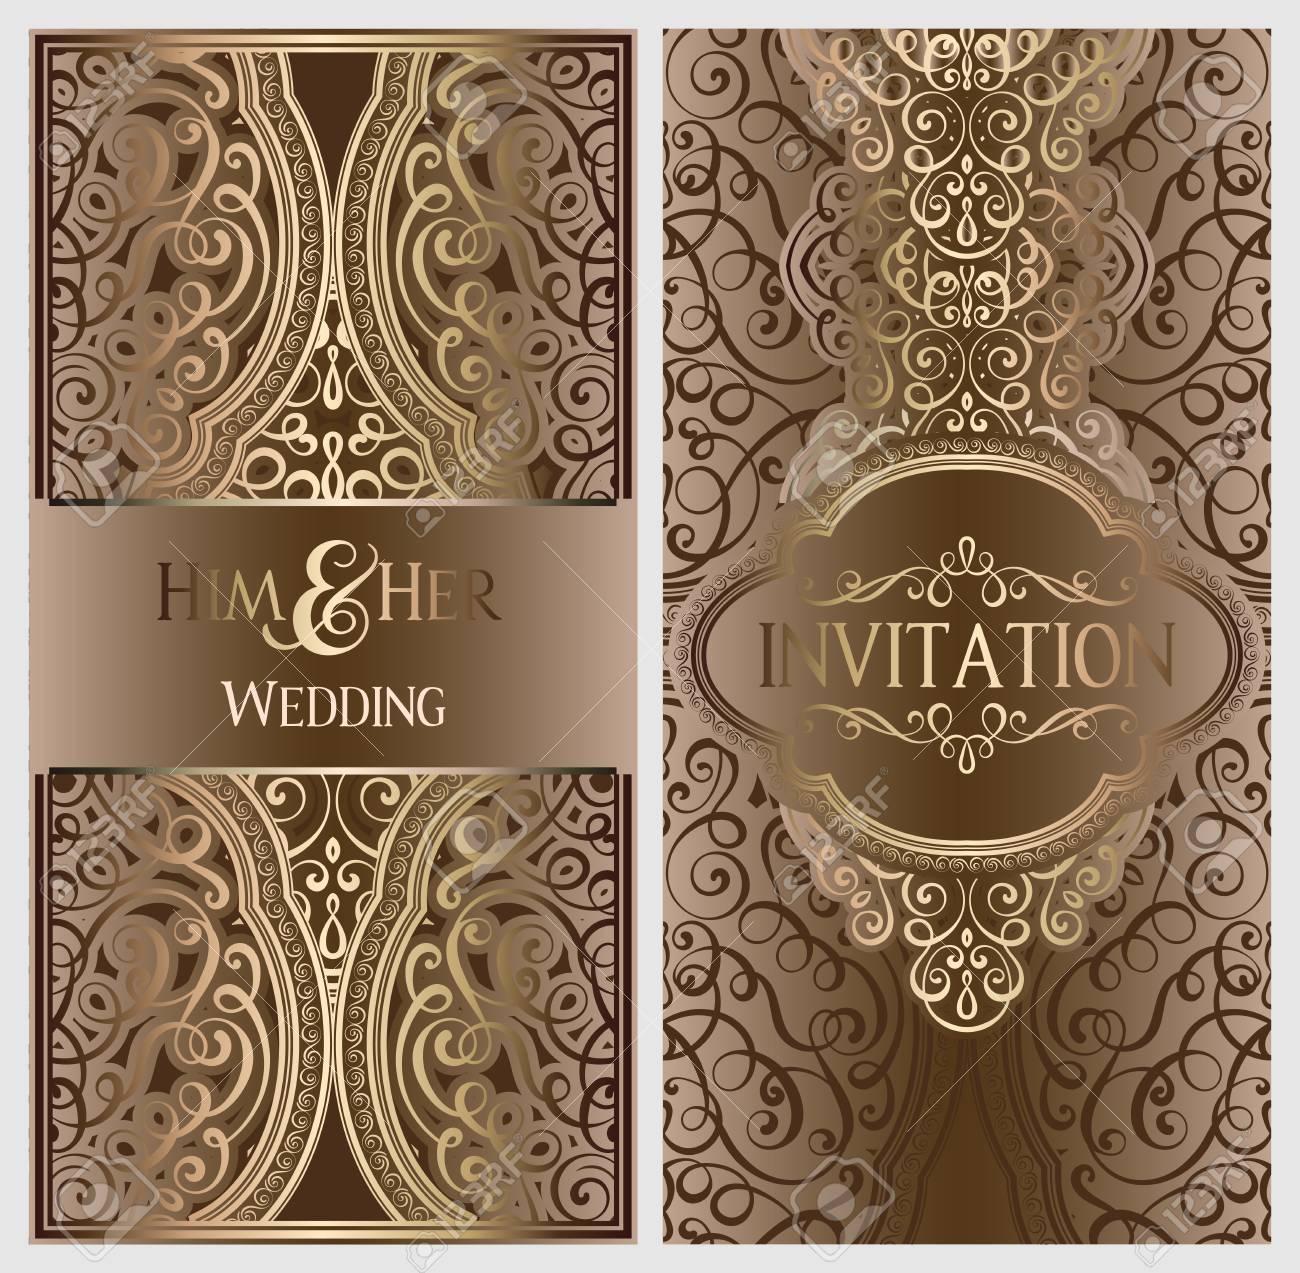 Luxury Wedding Invitations.Beige And Gold Luxury Wedding Invitation Card With Golden Shiny